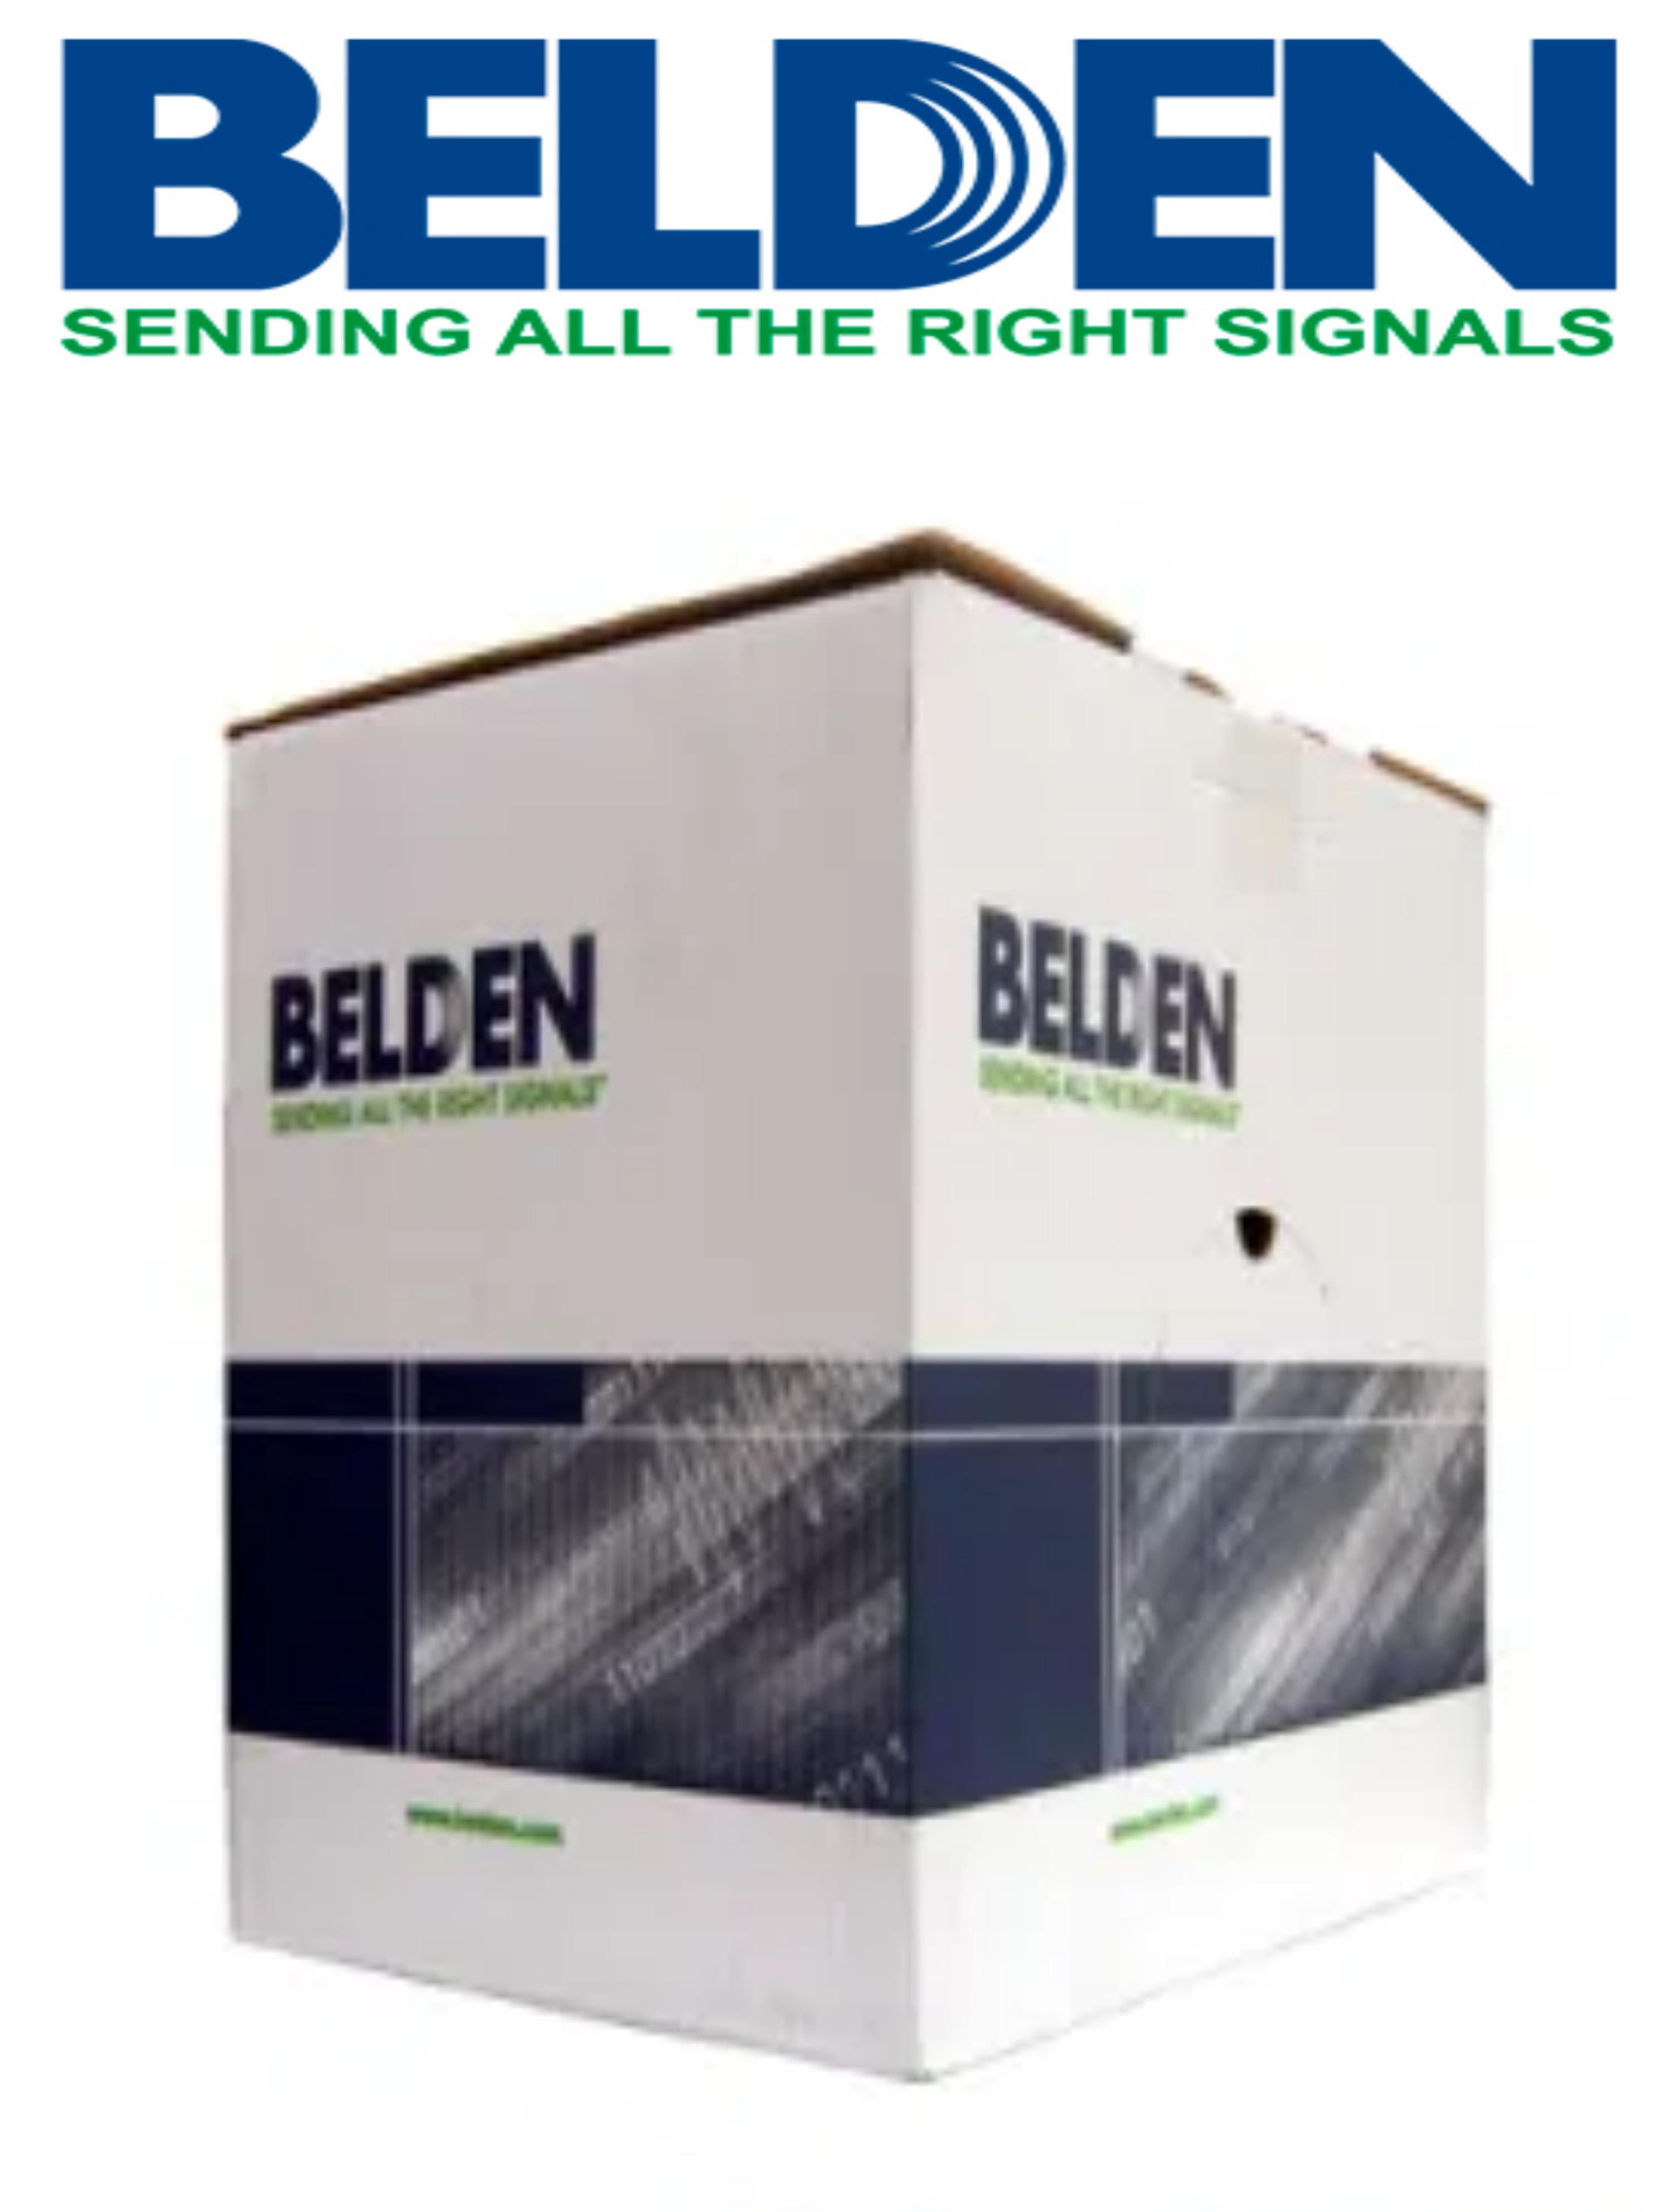 BELDEN 5502UE0081000- Cable de alarma/ 4 Conductores/ Cobre/ Calibre 22 AWG/ 305 Metros/ Recomendable para control de acceso/ Videoportero/ Audio/